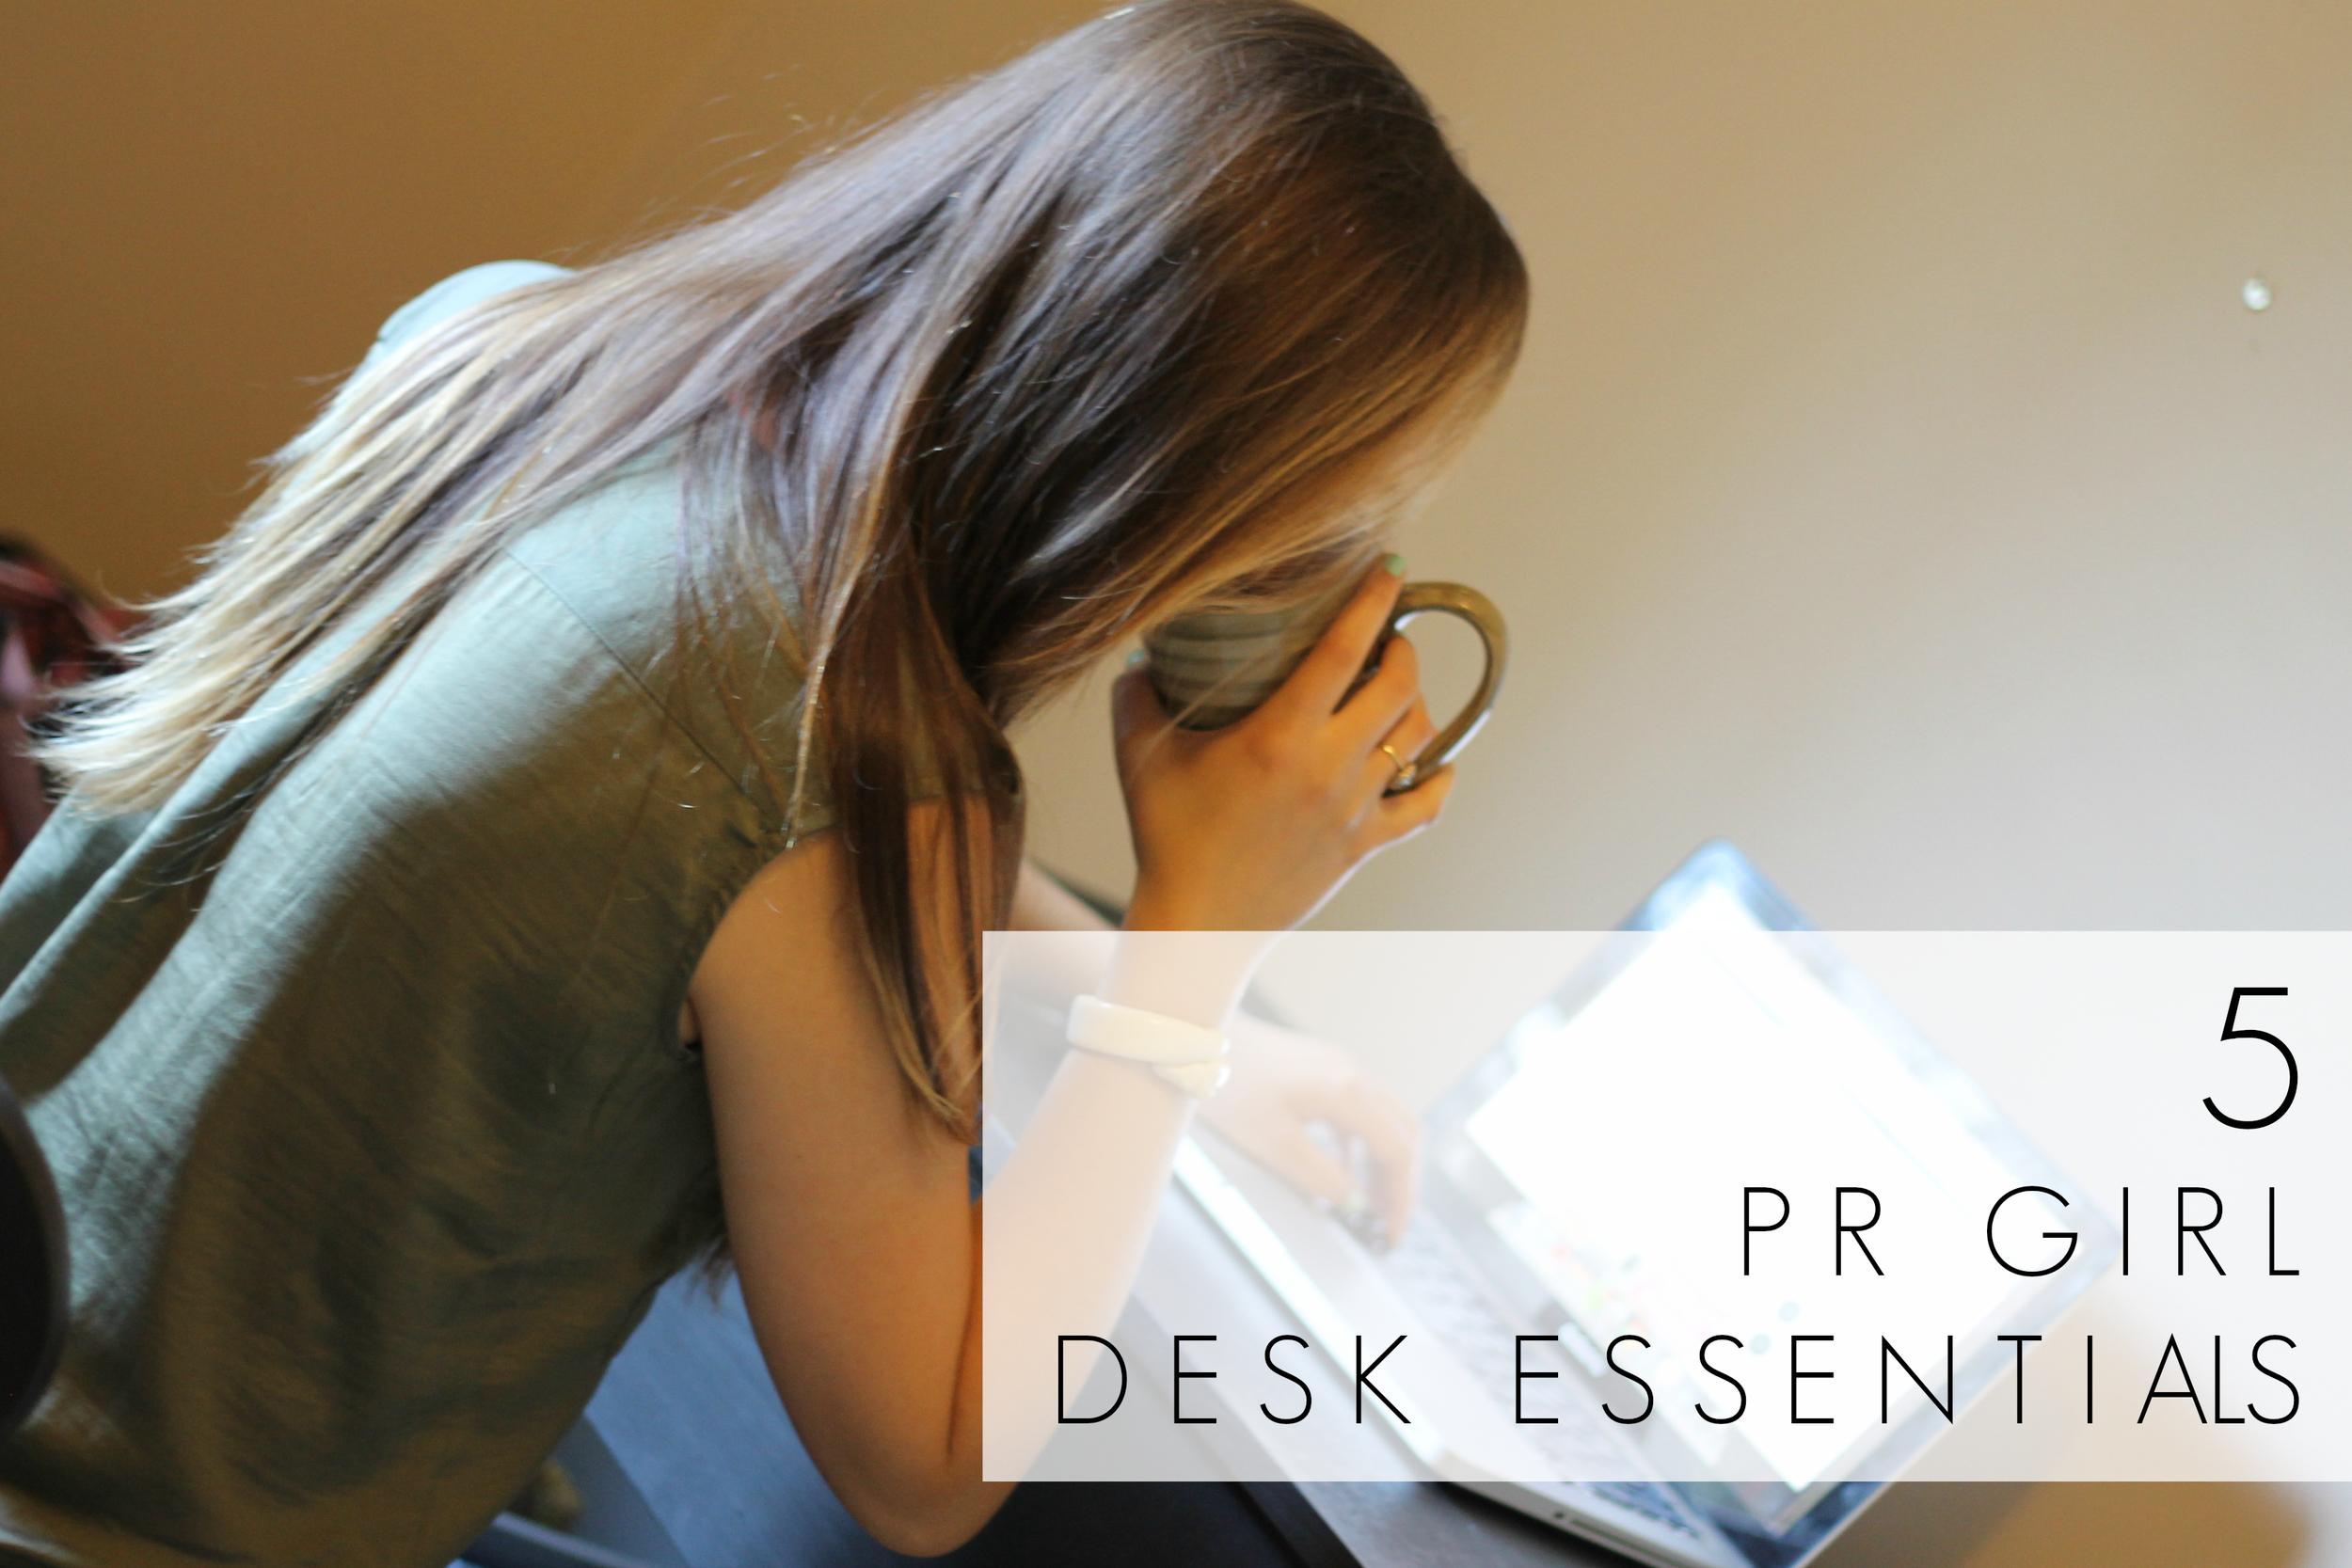 DeskEssentials